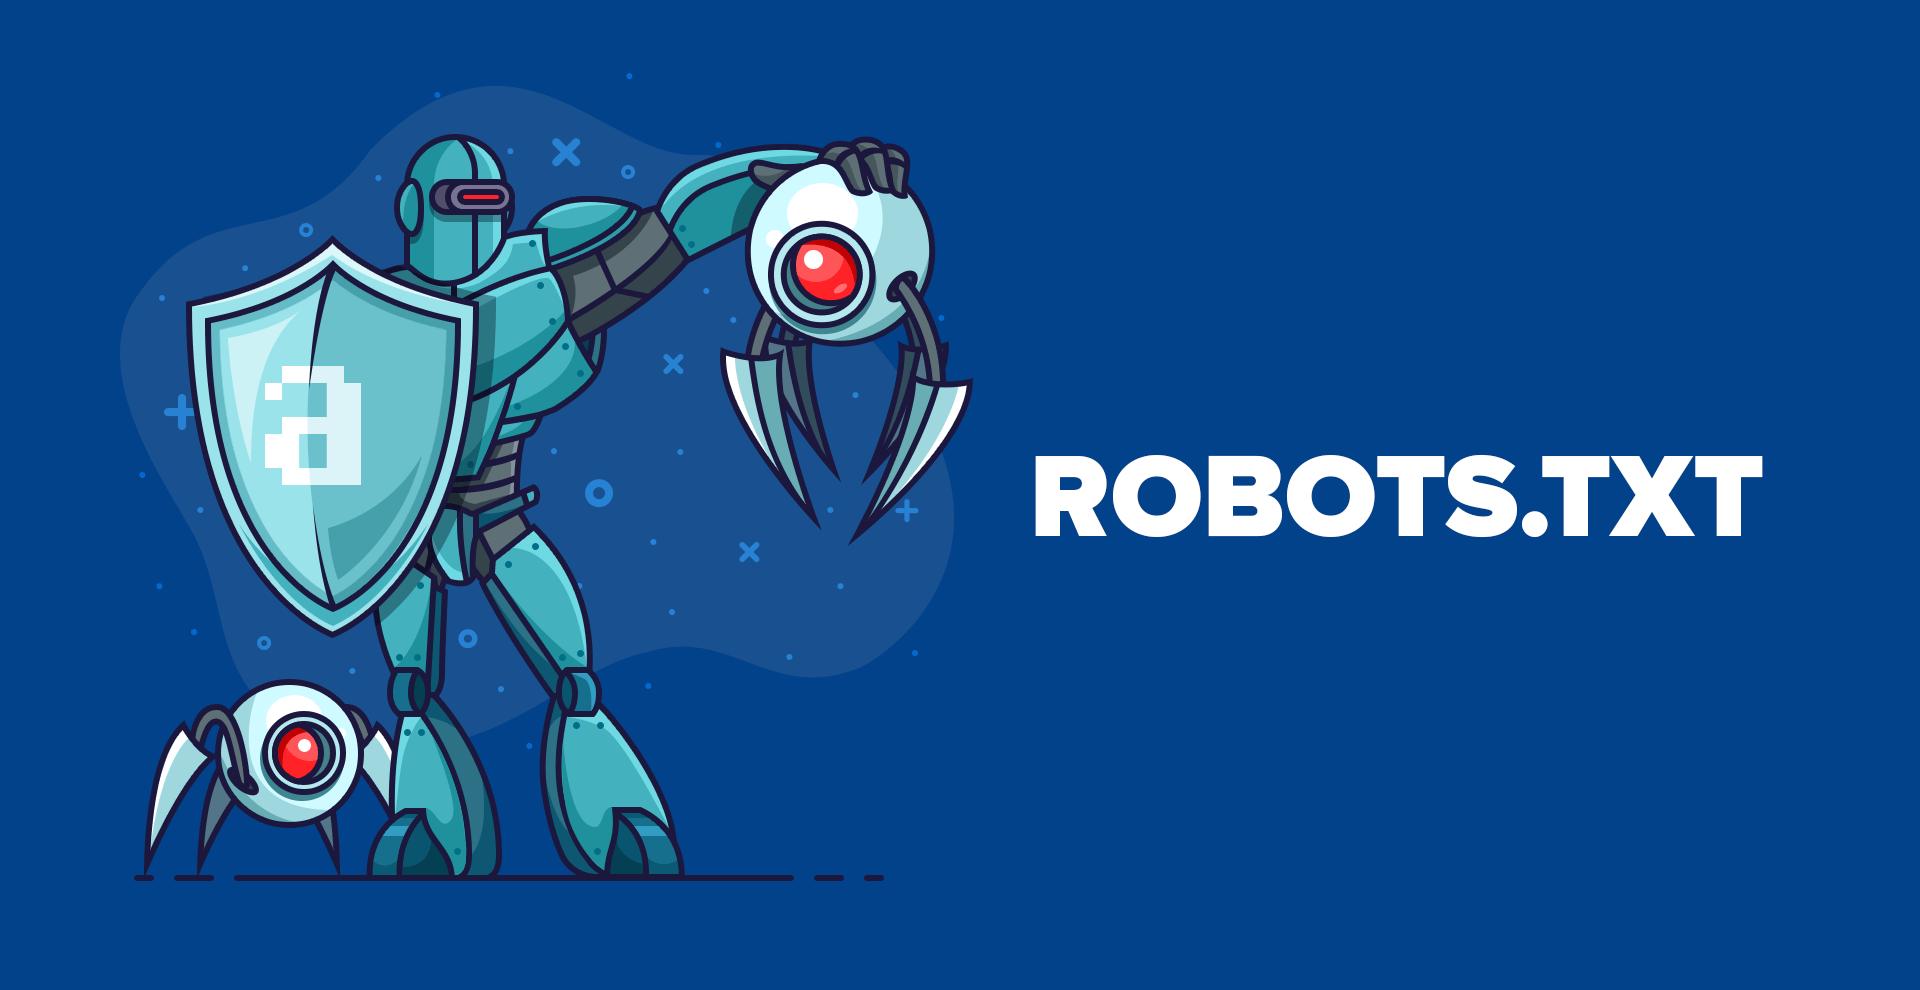 什么是robots.txt